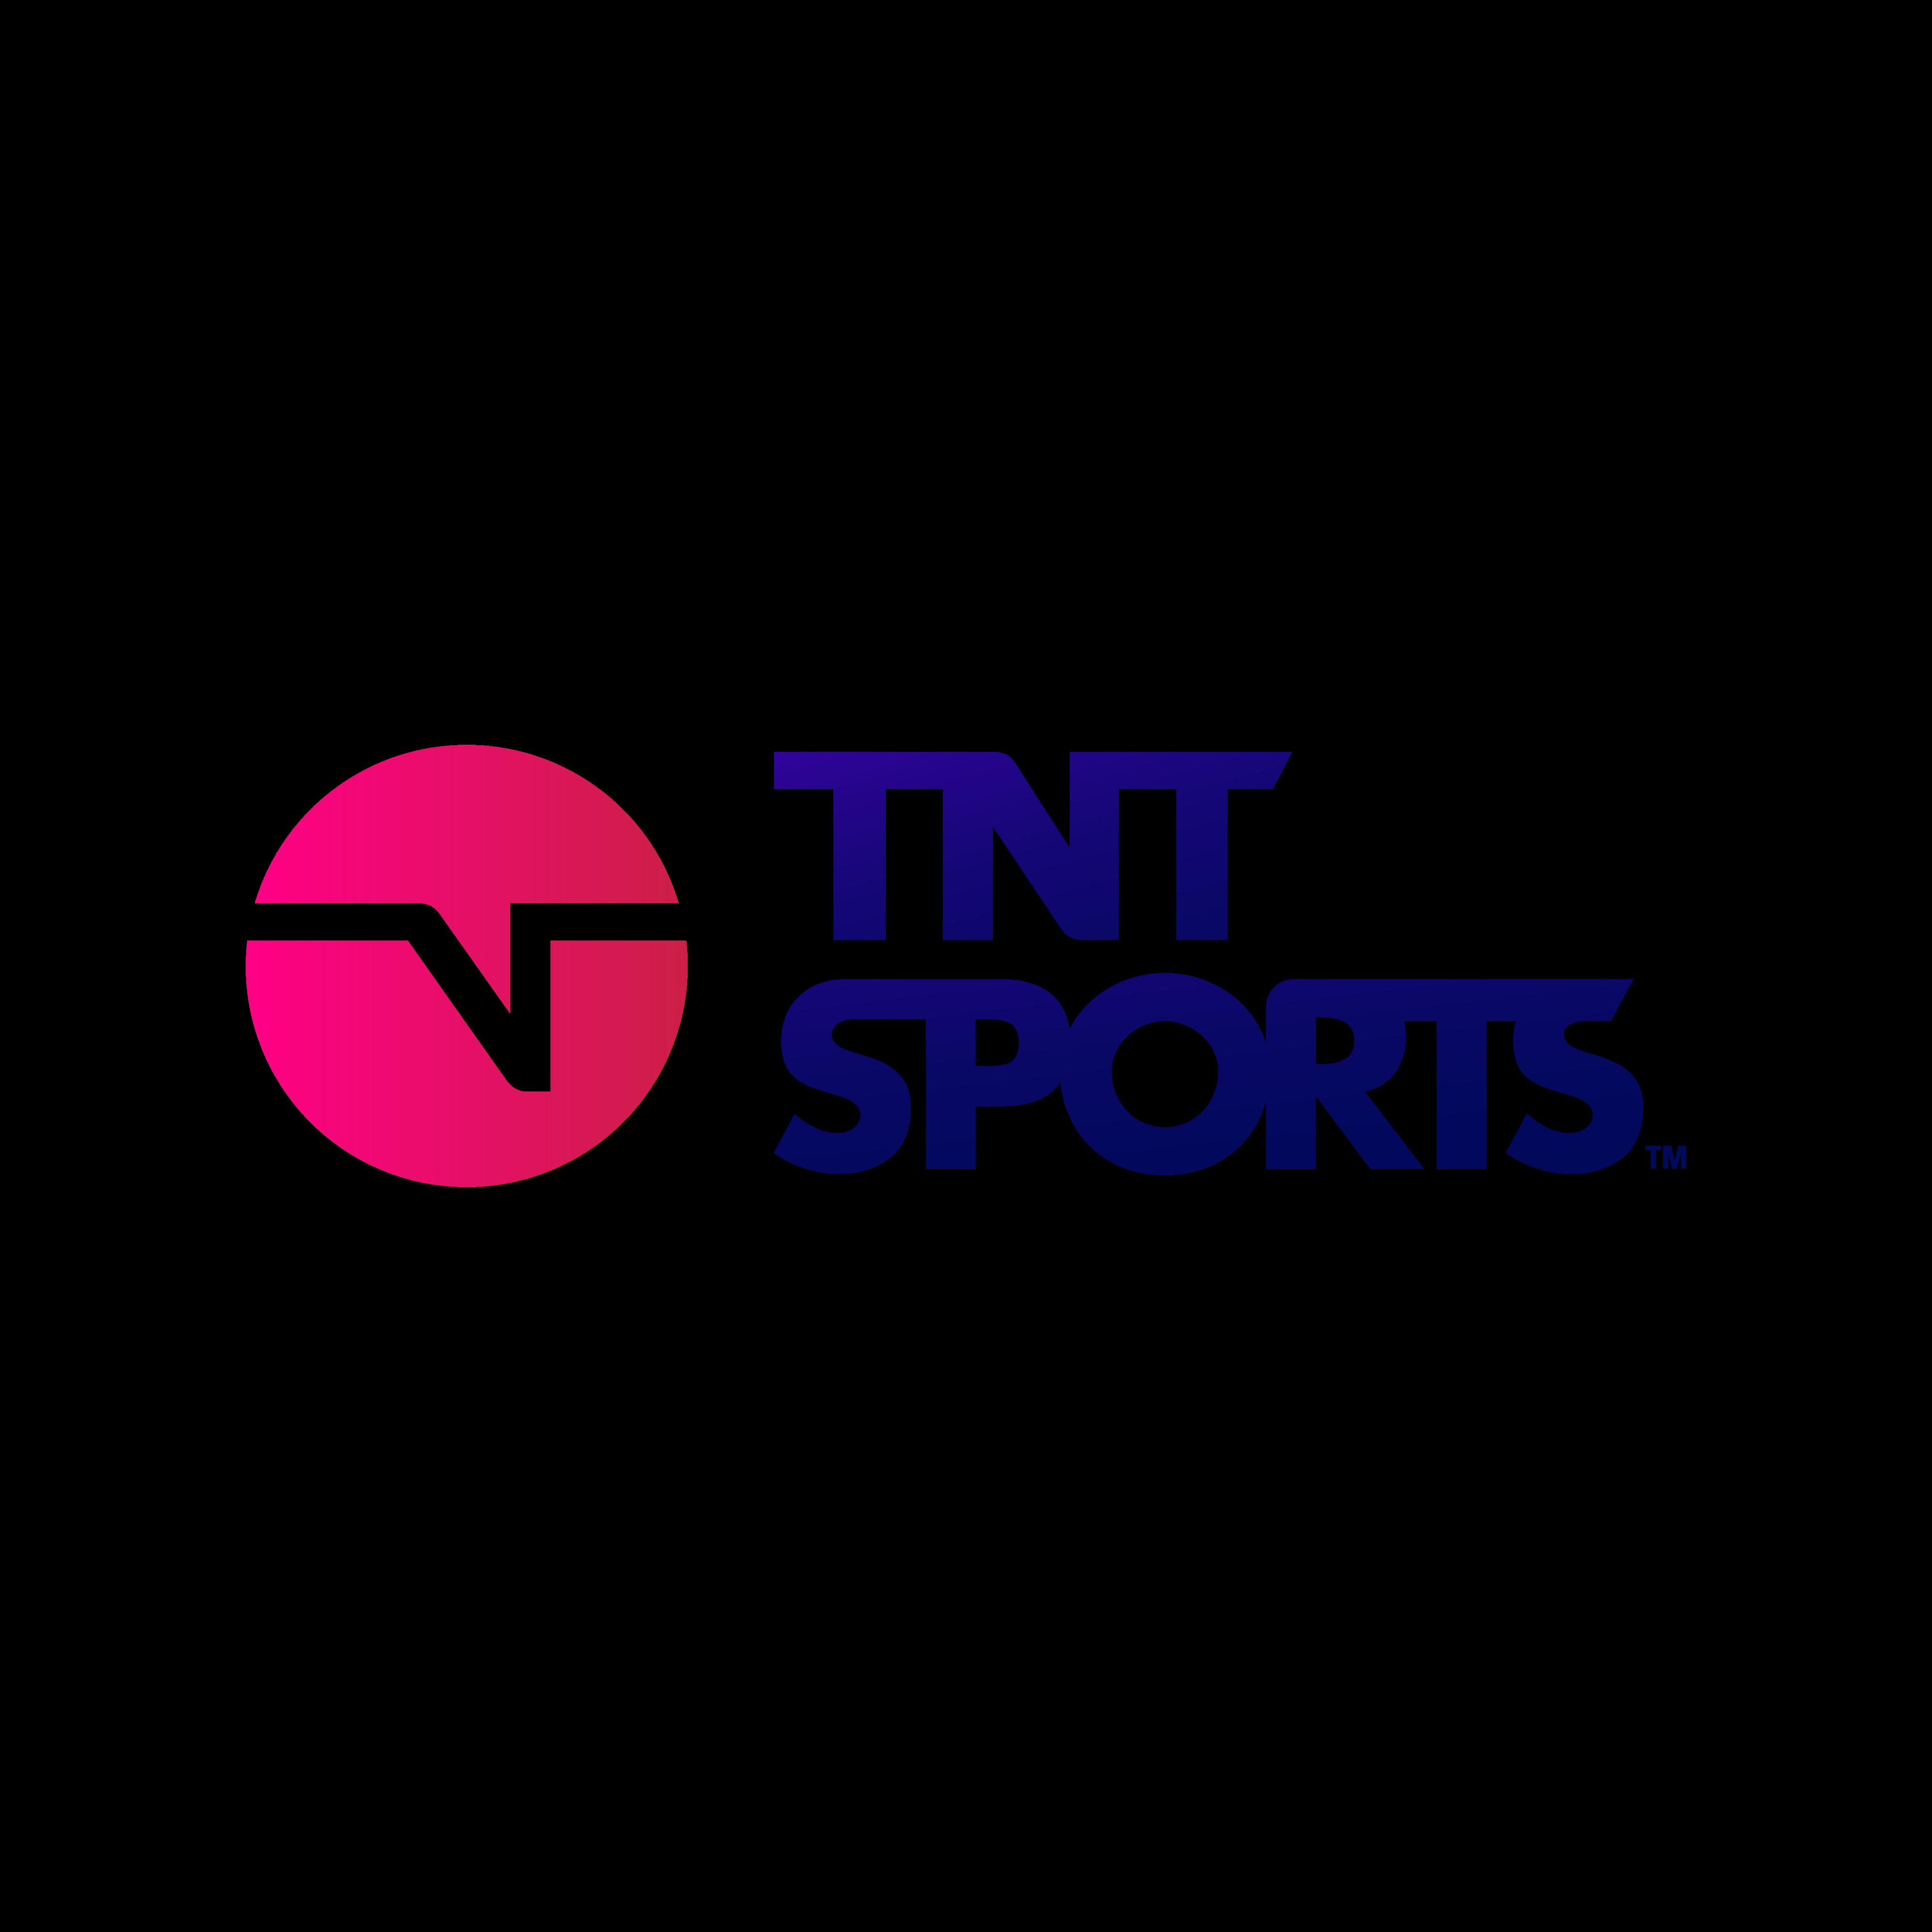 tnt sports logo 0 - TNT Sports Logo